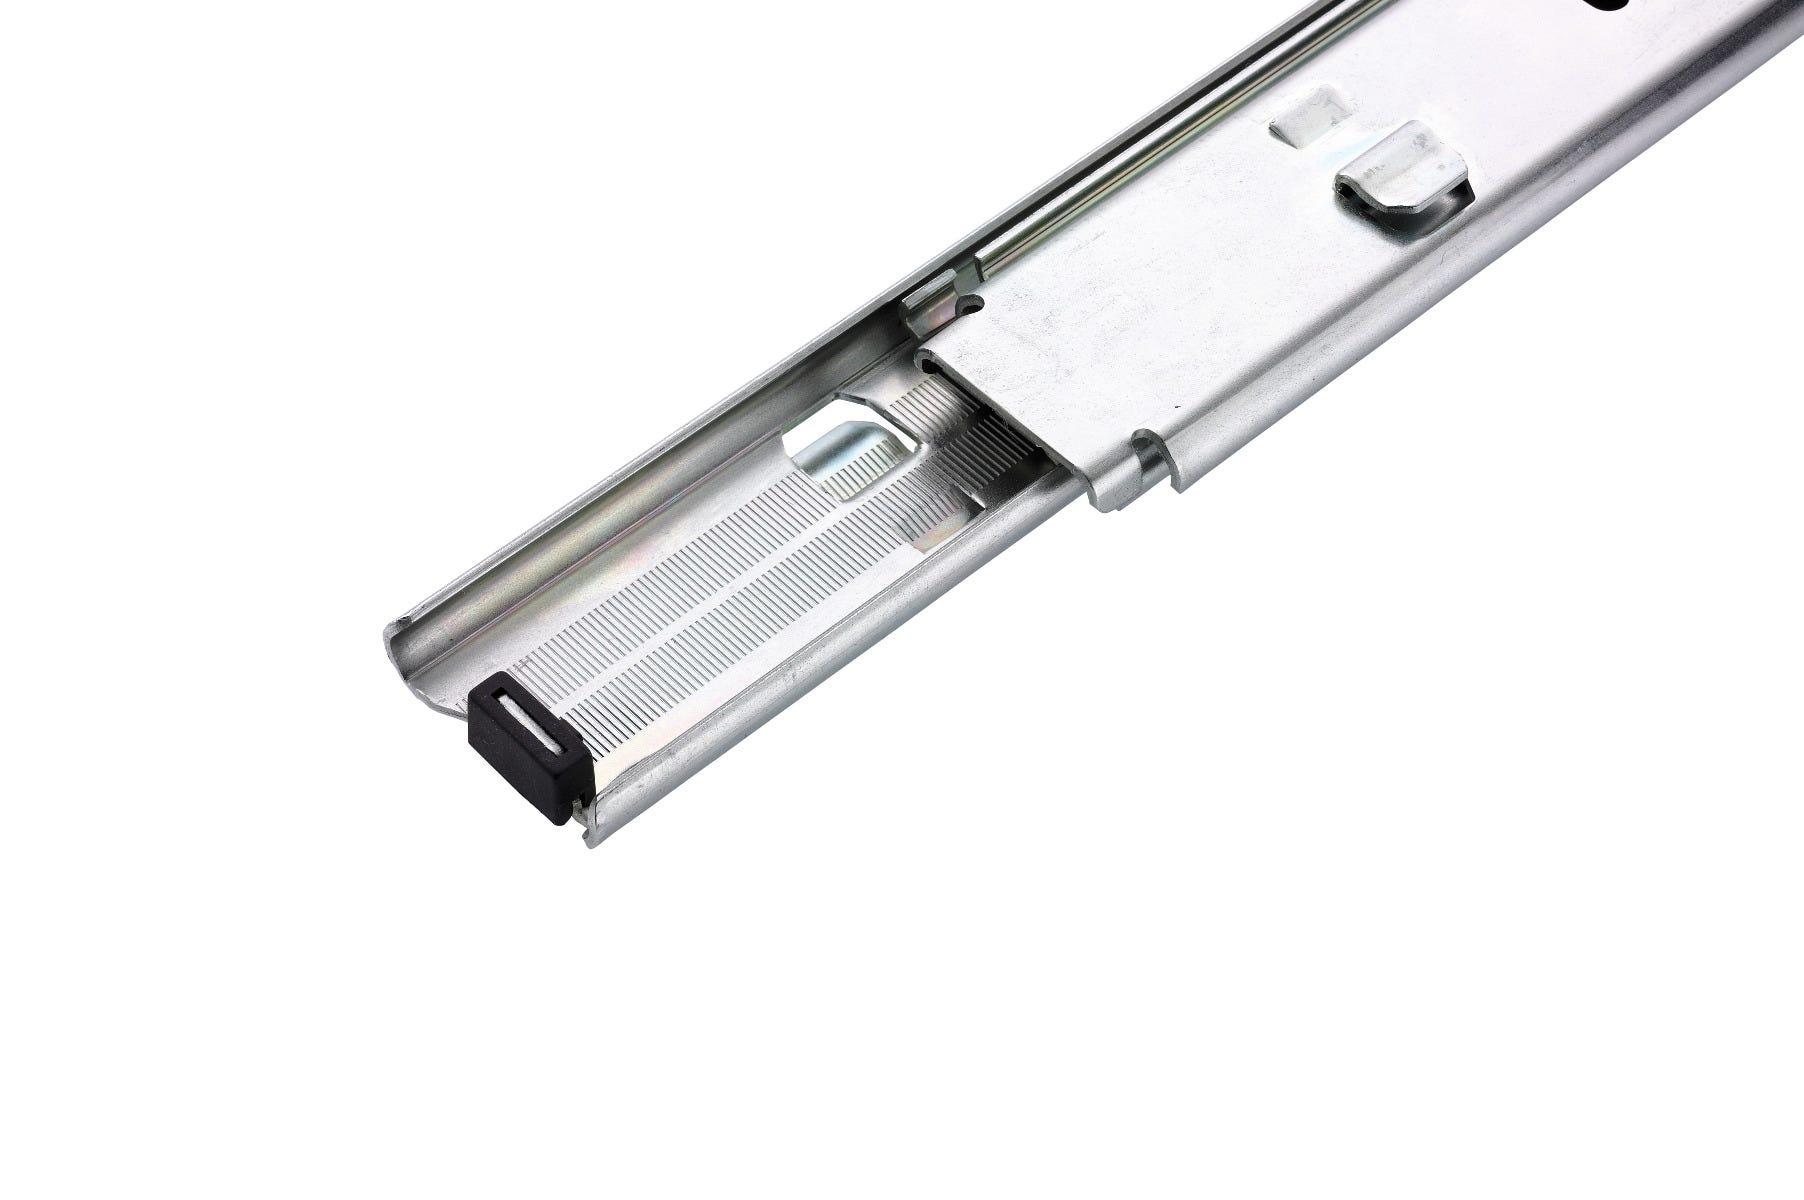 Light Duty Slide with Bayonet Mounting DZ7400-2